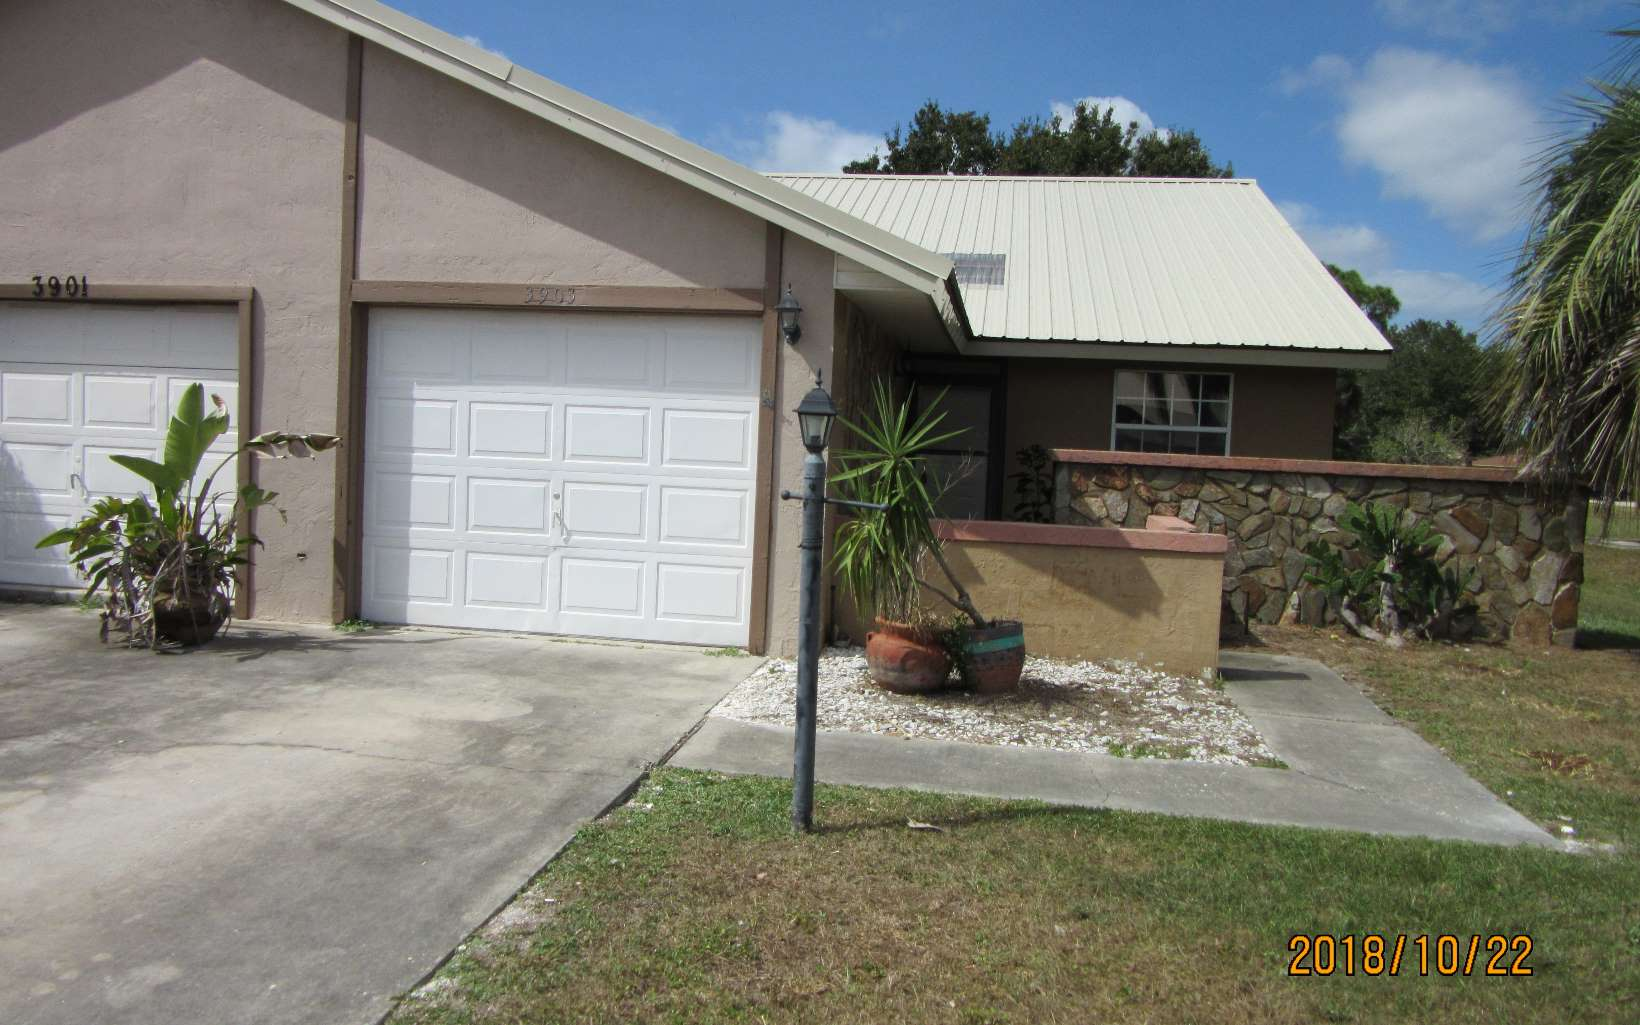 3903 Ponce De Leon Blvd, Sebring, FL 33872